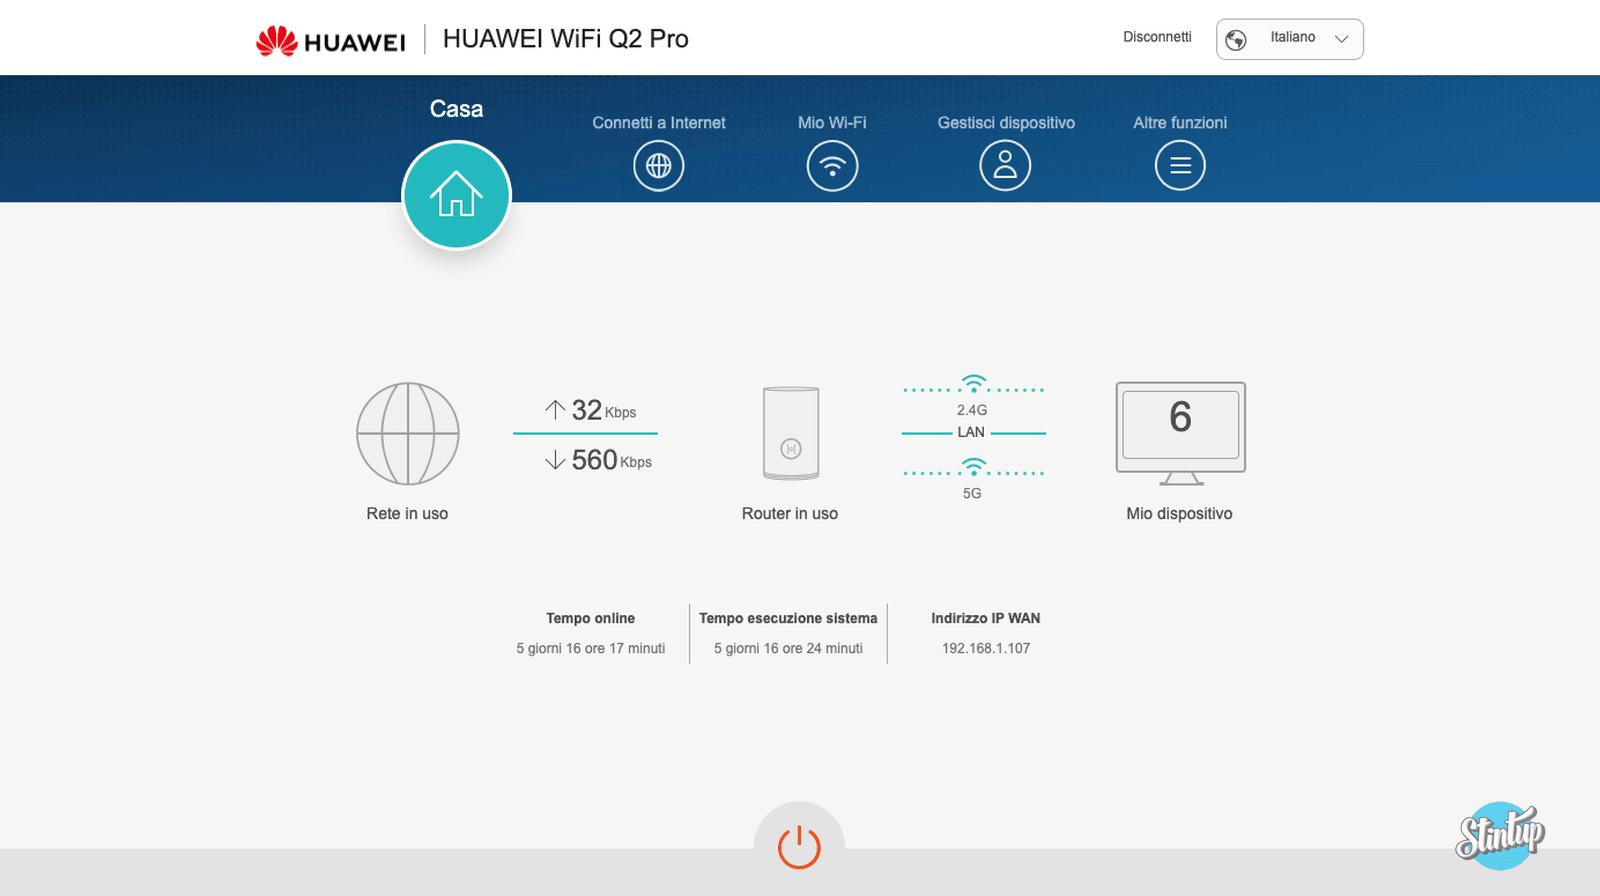 Screenshot 2019 10 31 at 13.14.03 risultato